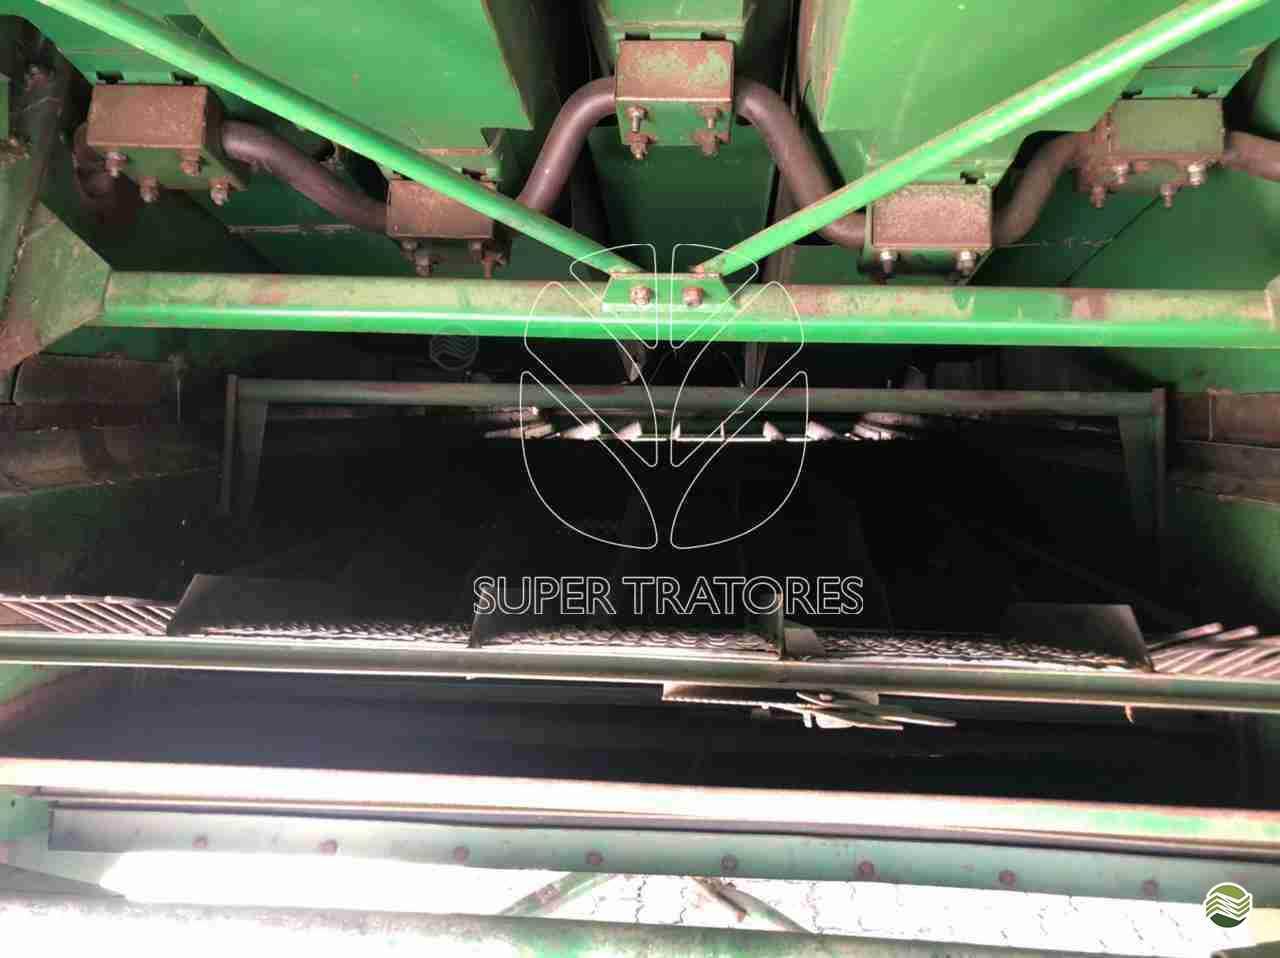 JOHN DEERE JOHN DEERE 1175  1999/1999 Super Tratores - New Holland - Matriz